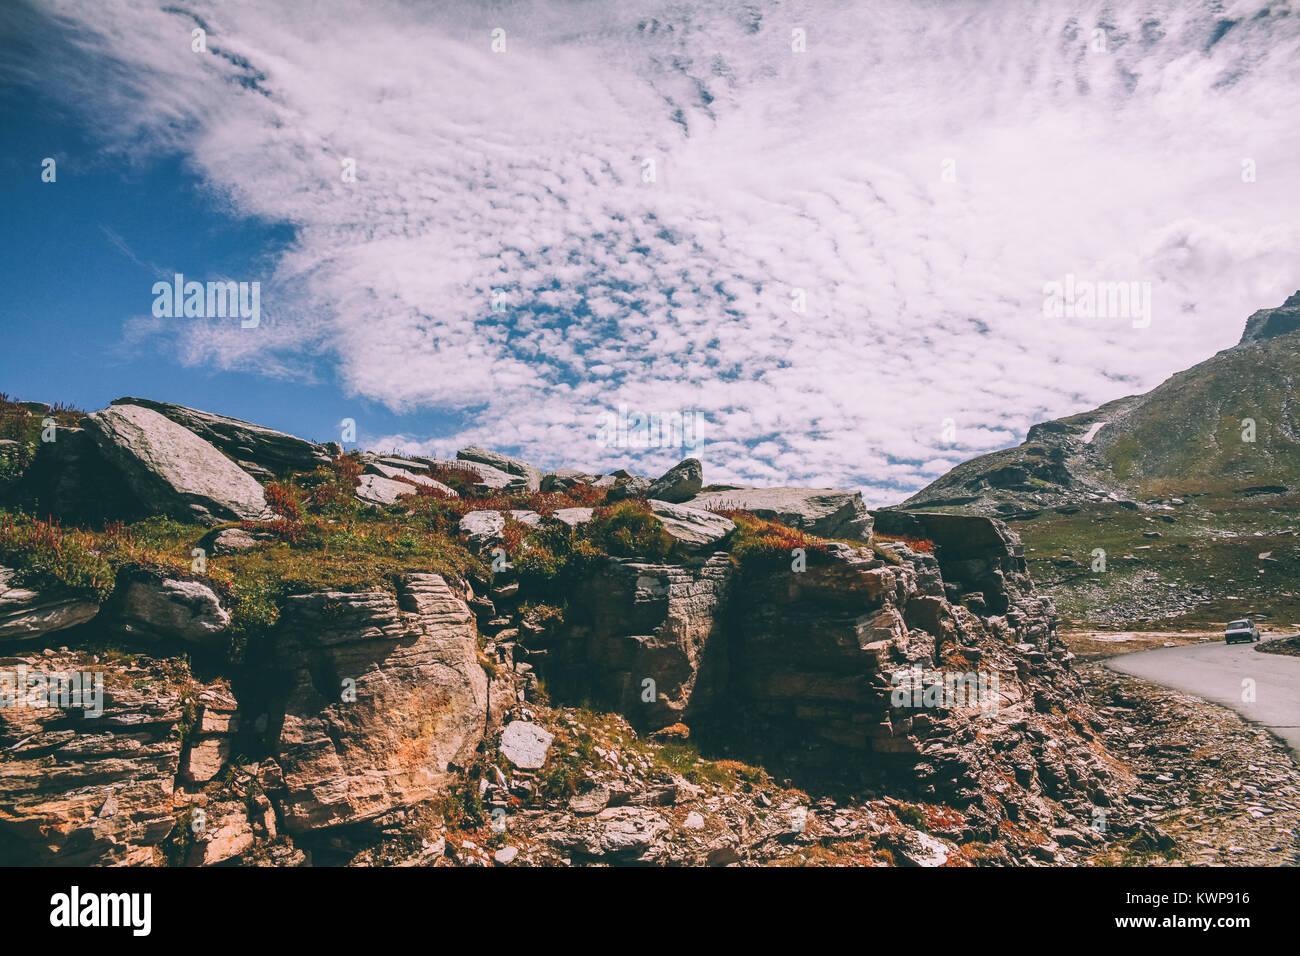 beautiful rocky scenic landscape in indian himalayas, keylong region - Stock Image